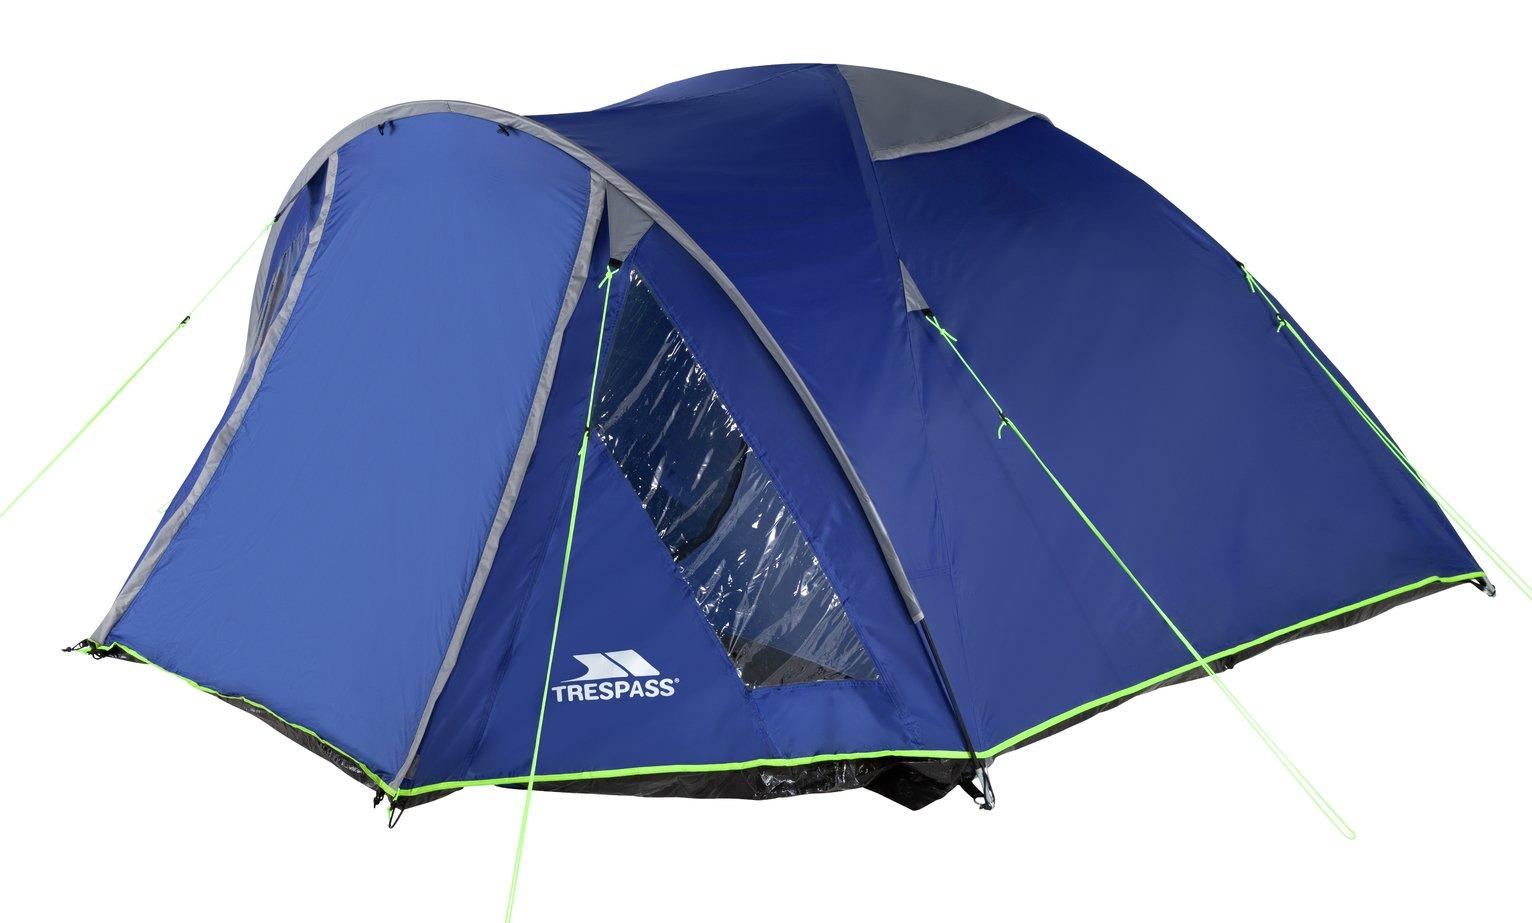 Trespass Go Further 6 Man Carpeted Tent